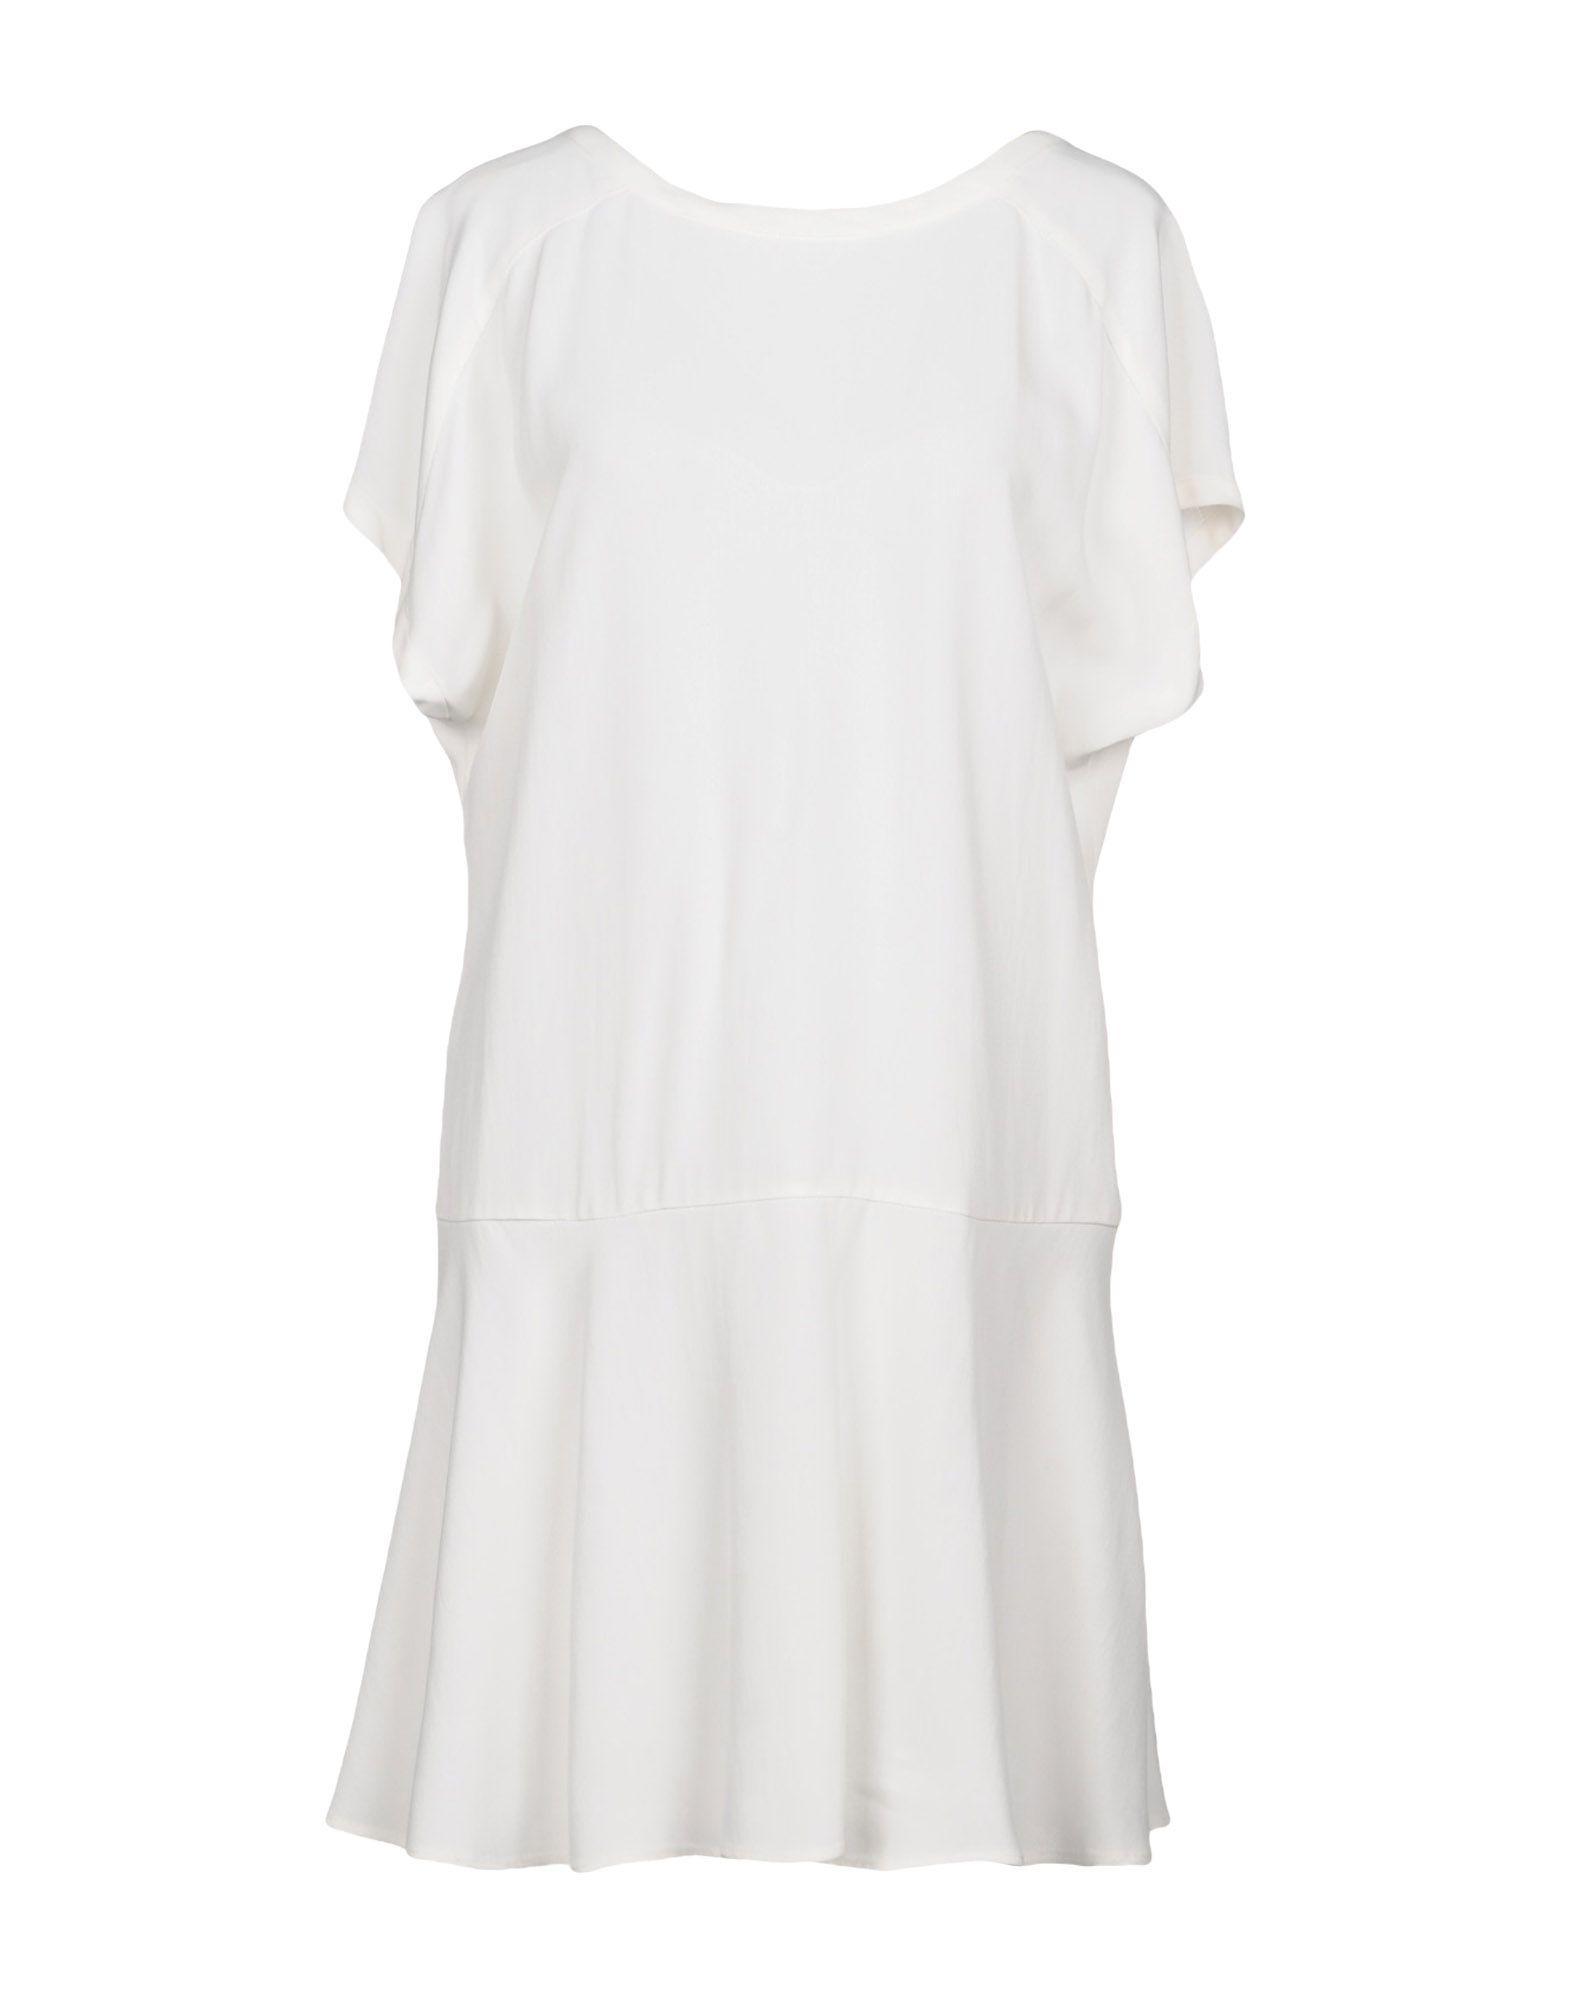 Red Valentino Short Dress In White